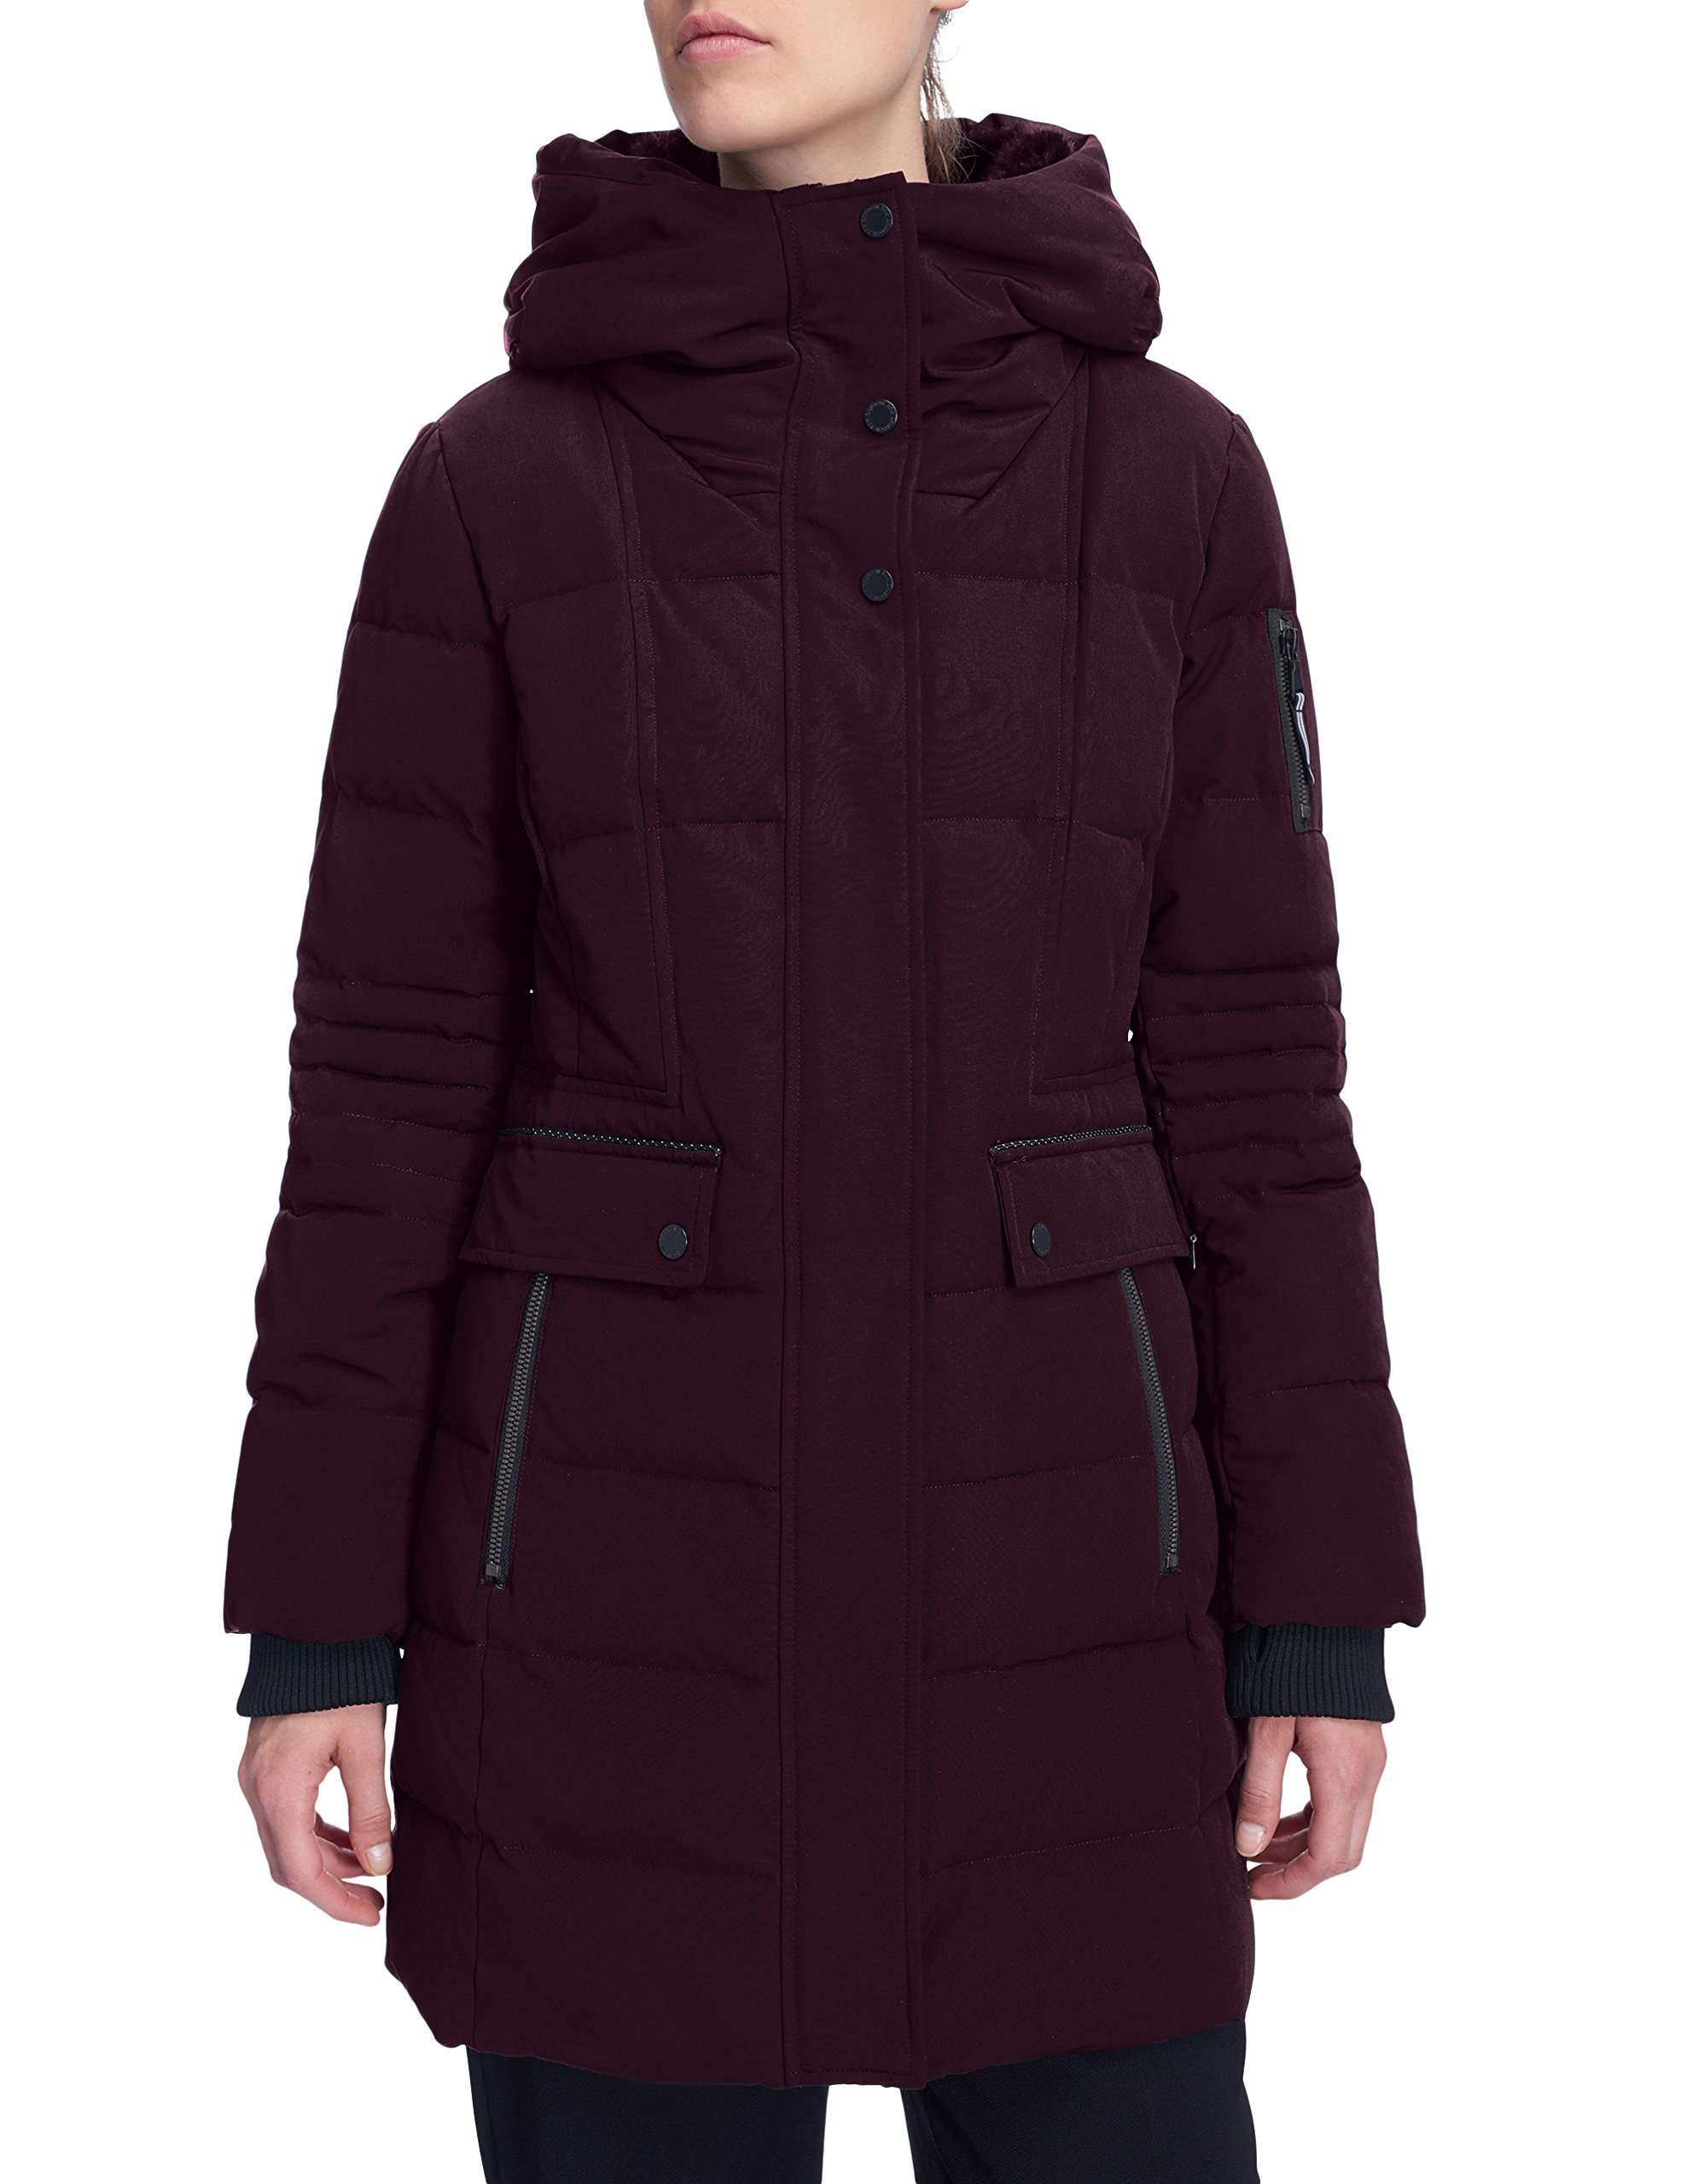 Alpine North Women's Winter Fur Down Parka Jacket Hooded Mid-Length Coat